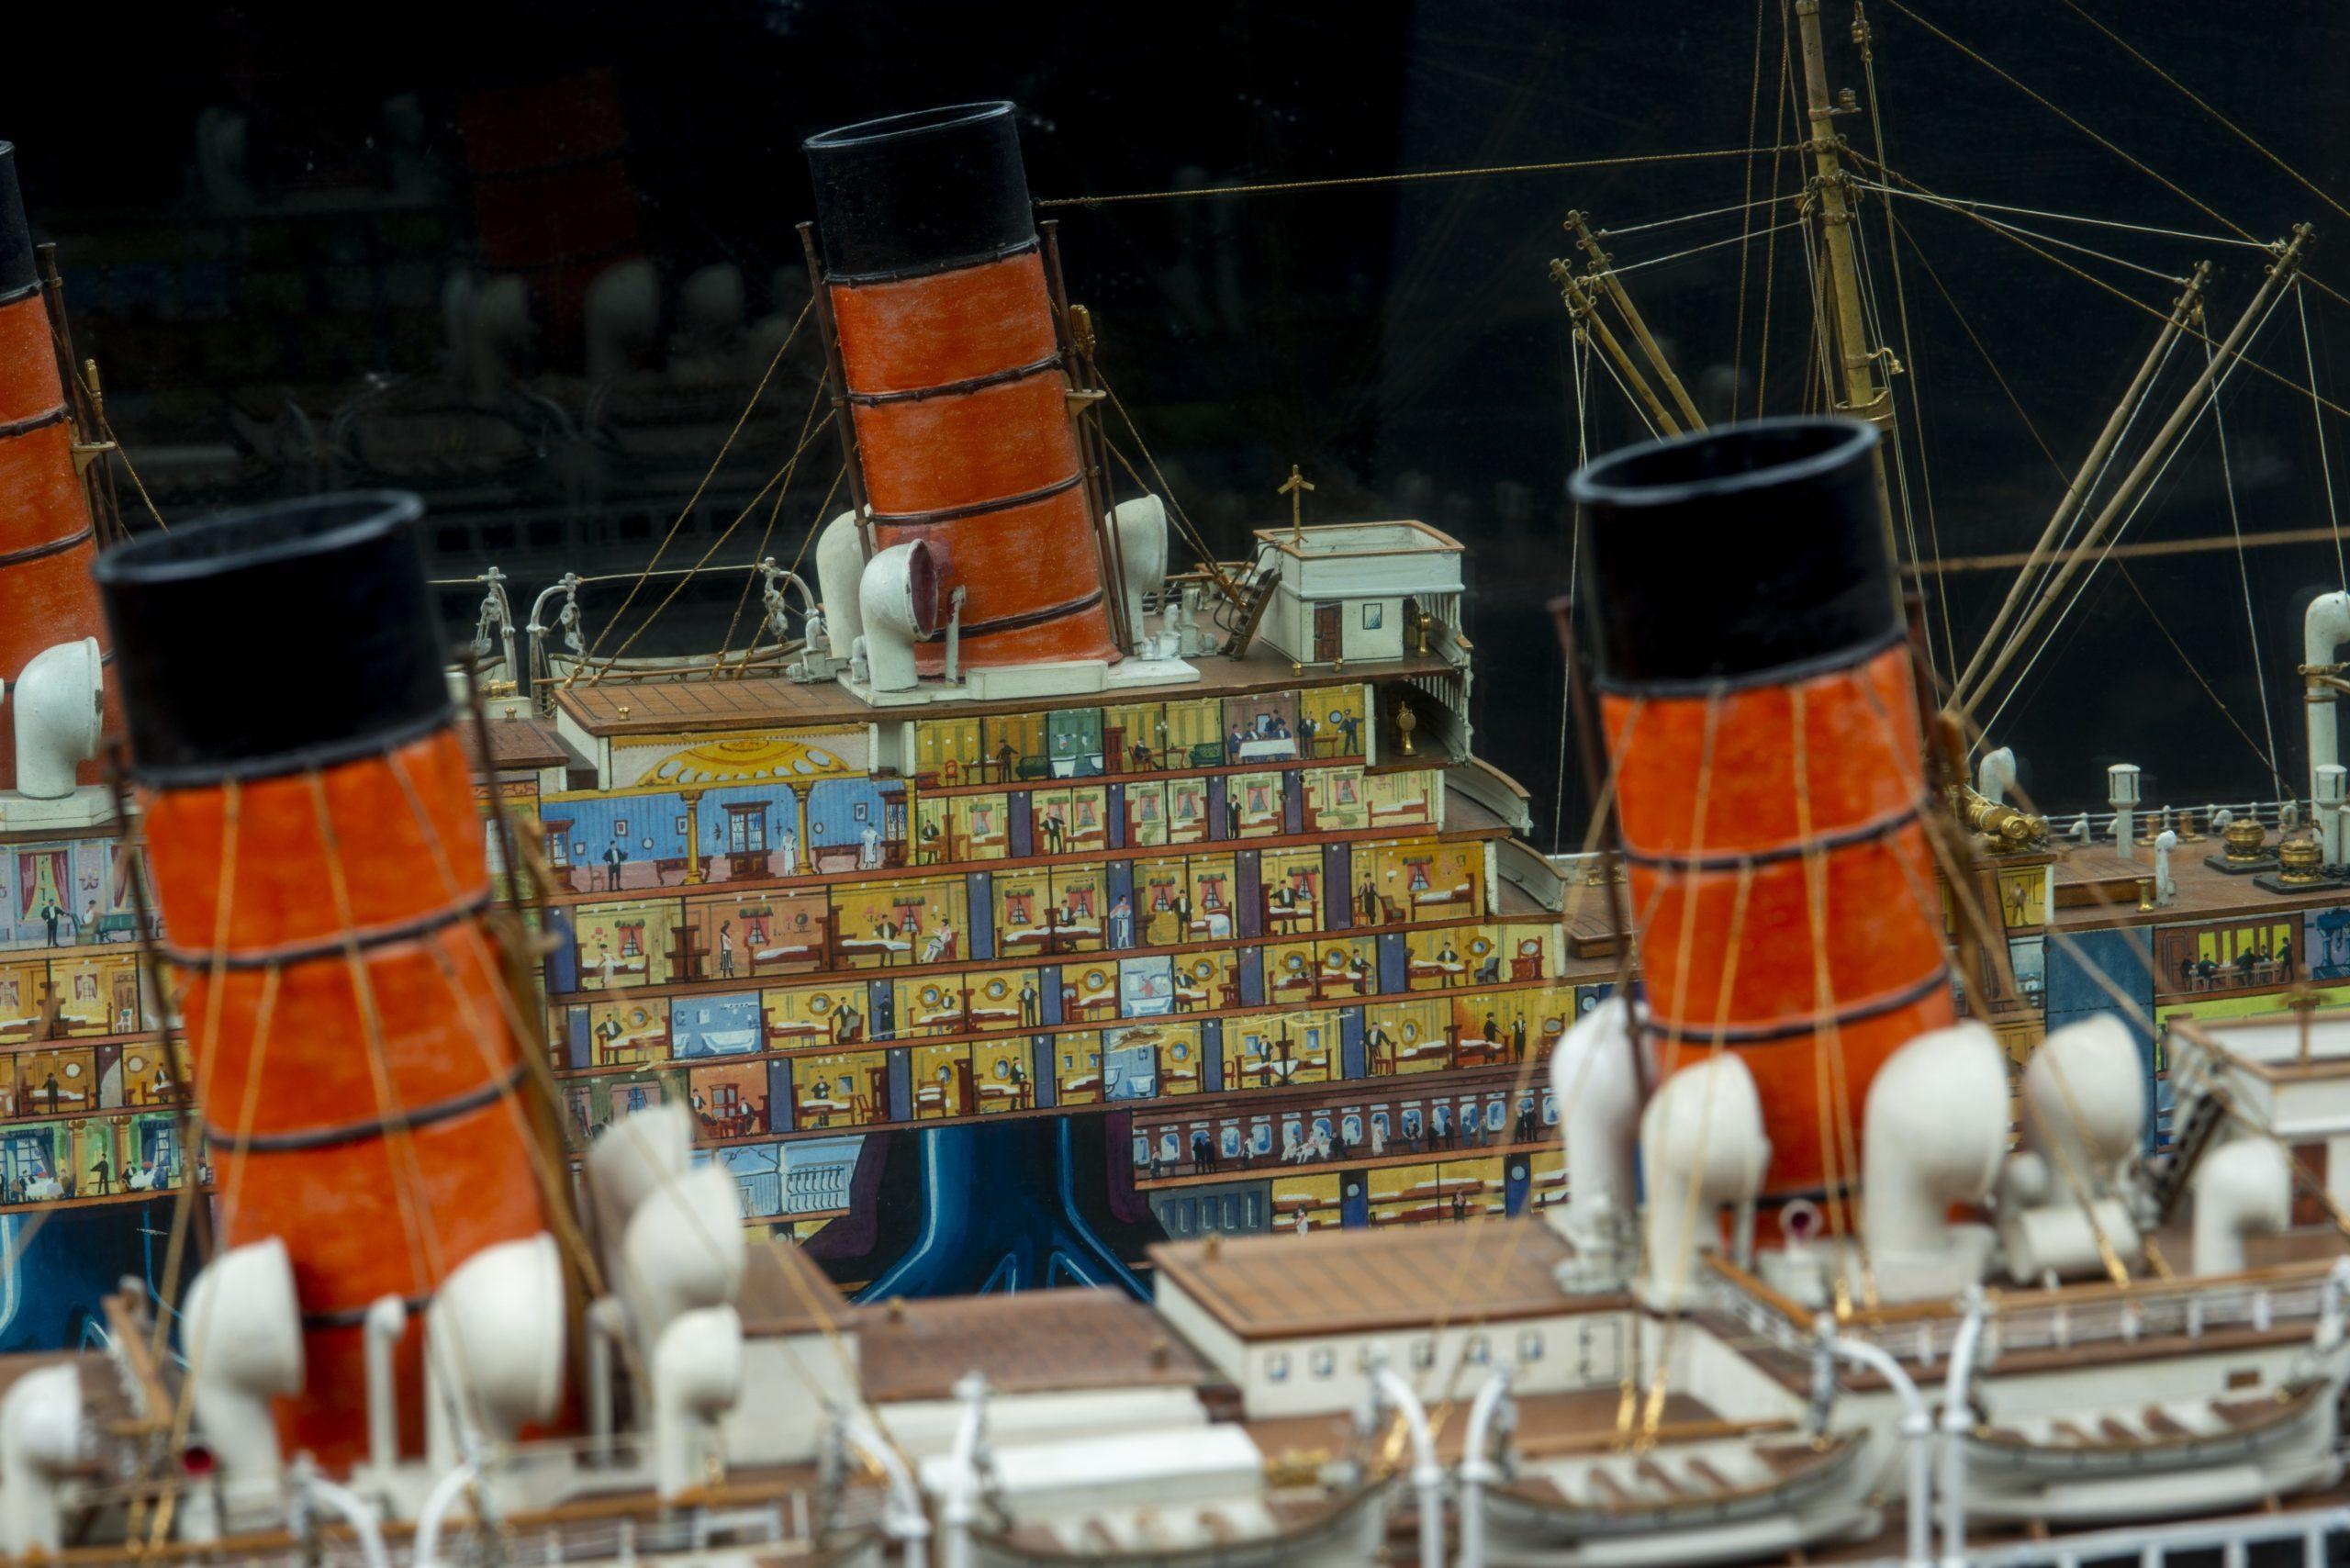 Inside Aquitania: a ship model in detail